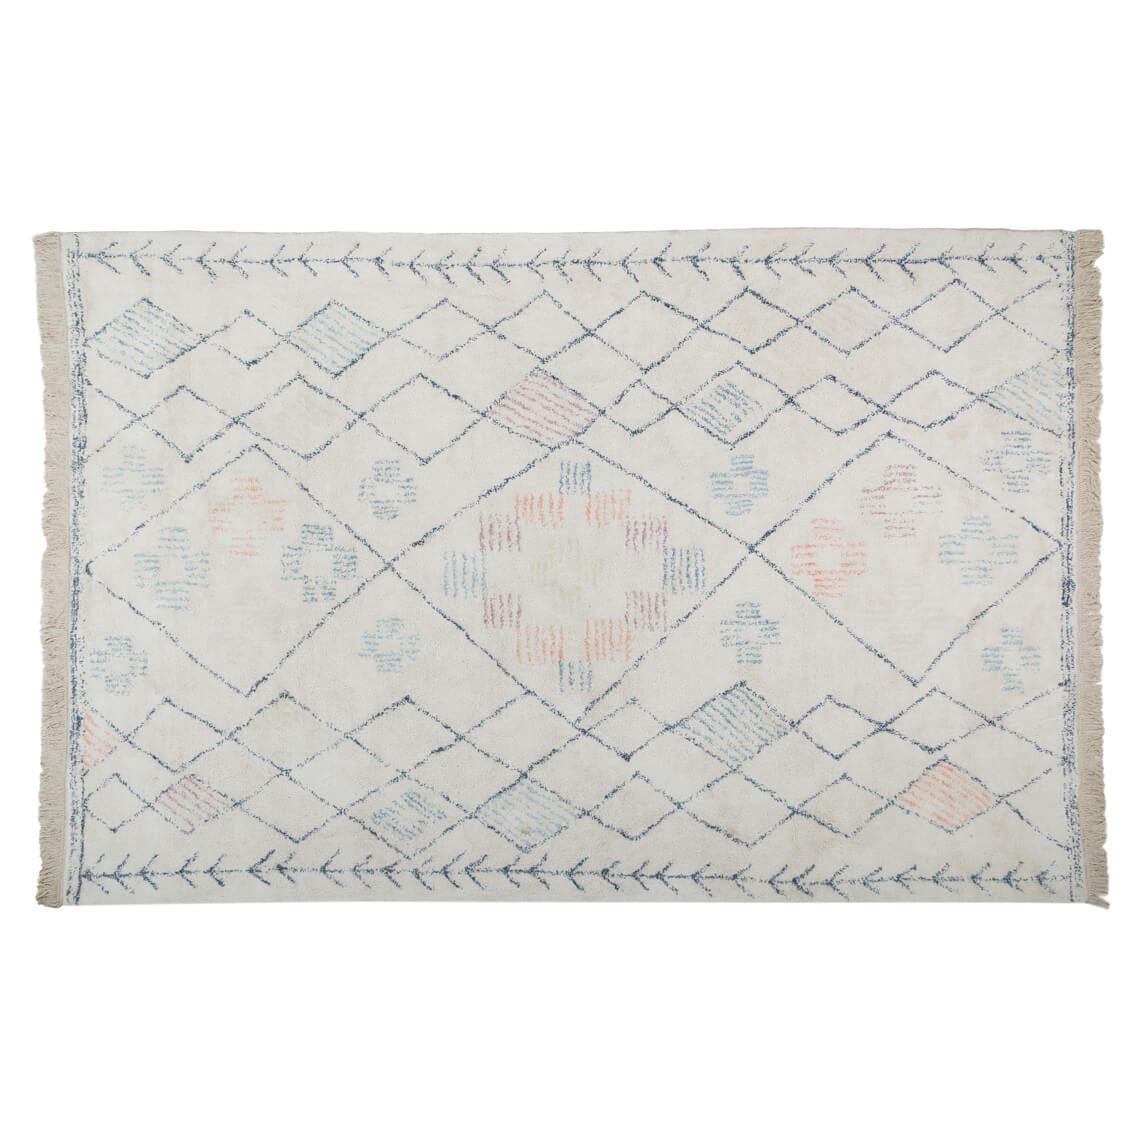 Amihan Floor Rug Size W 200cm x D 300cm x H 1cm Freedom